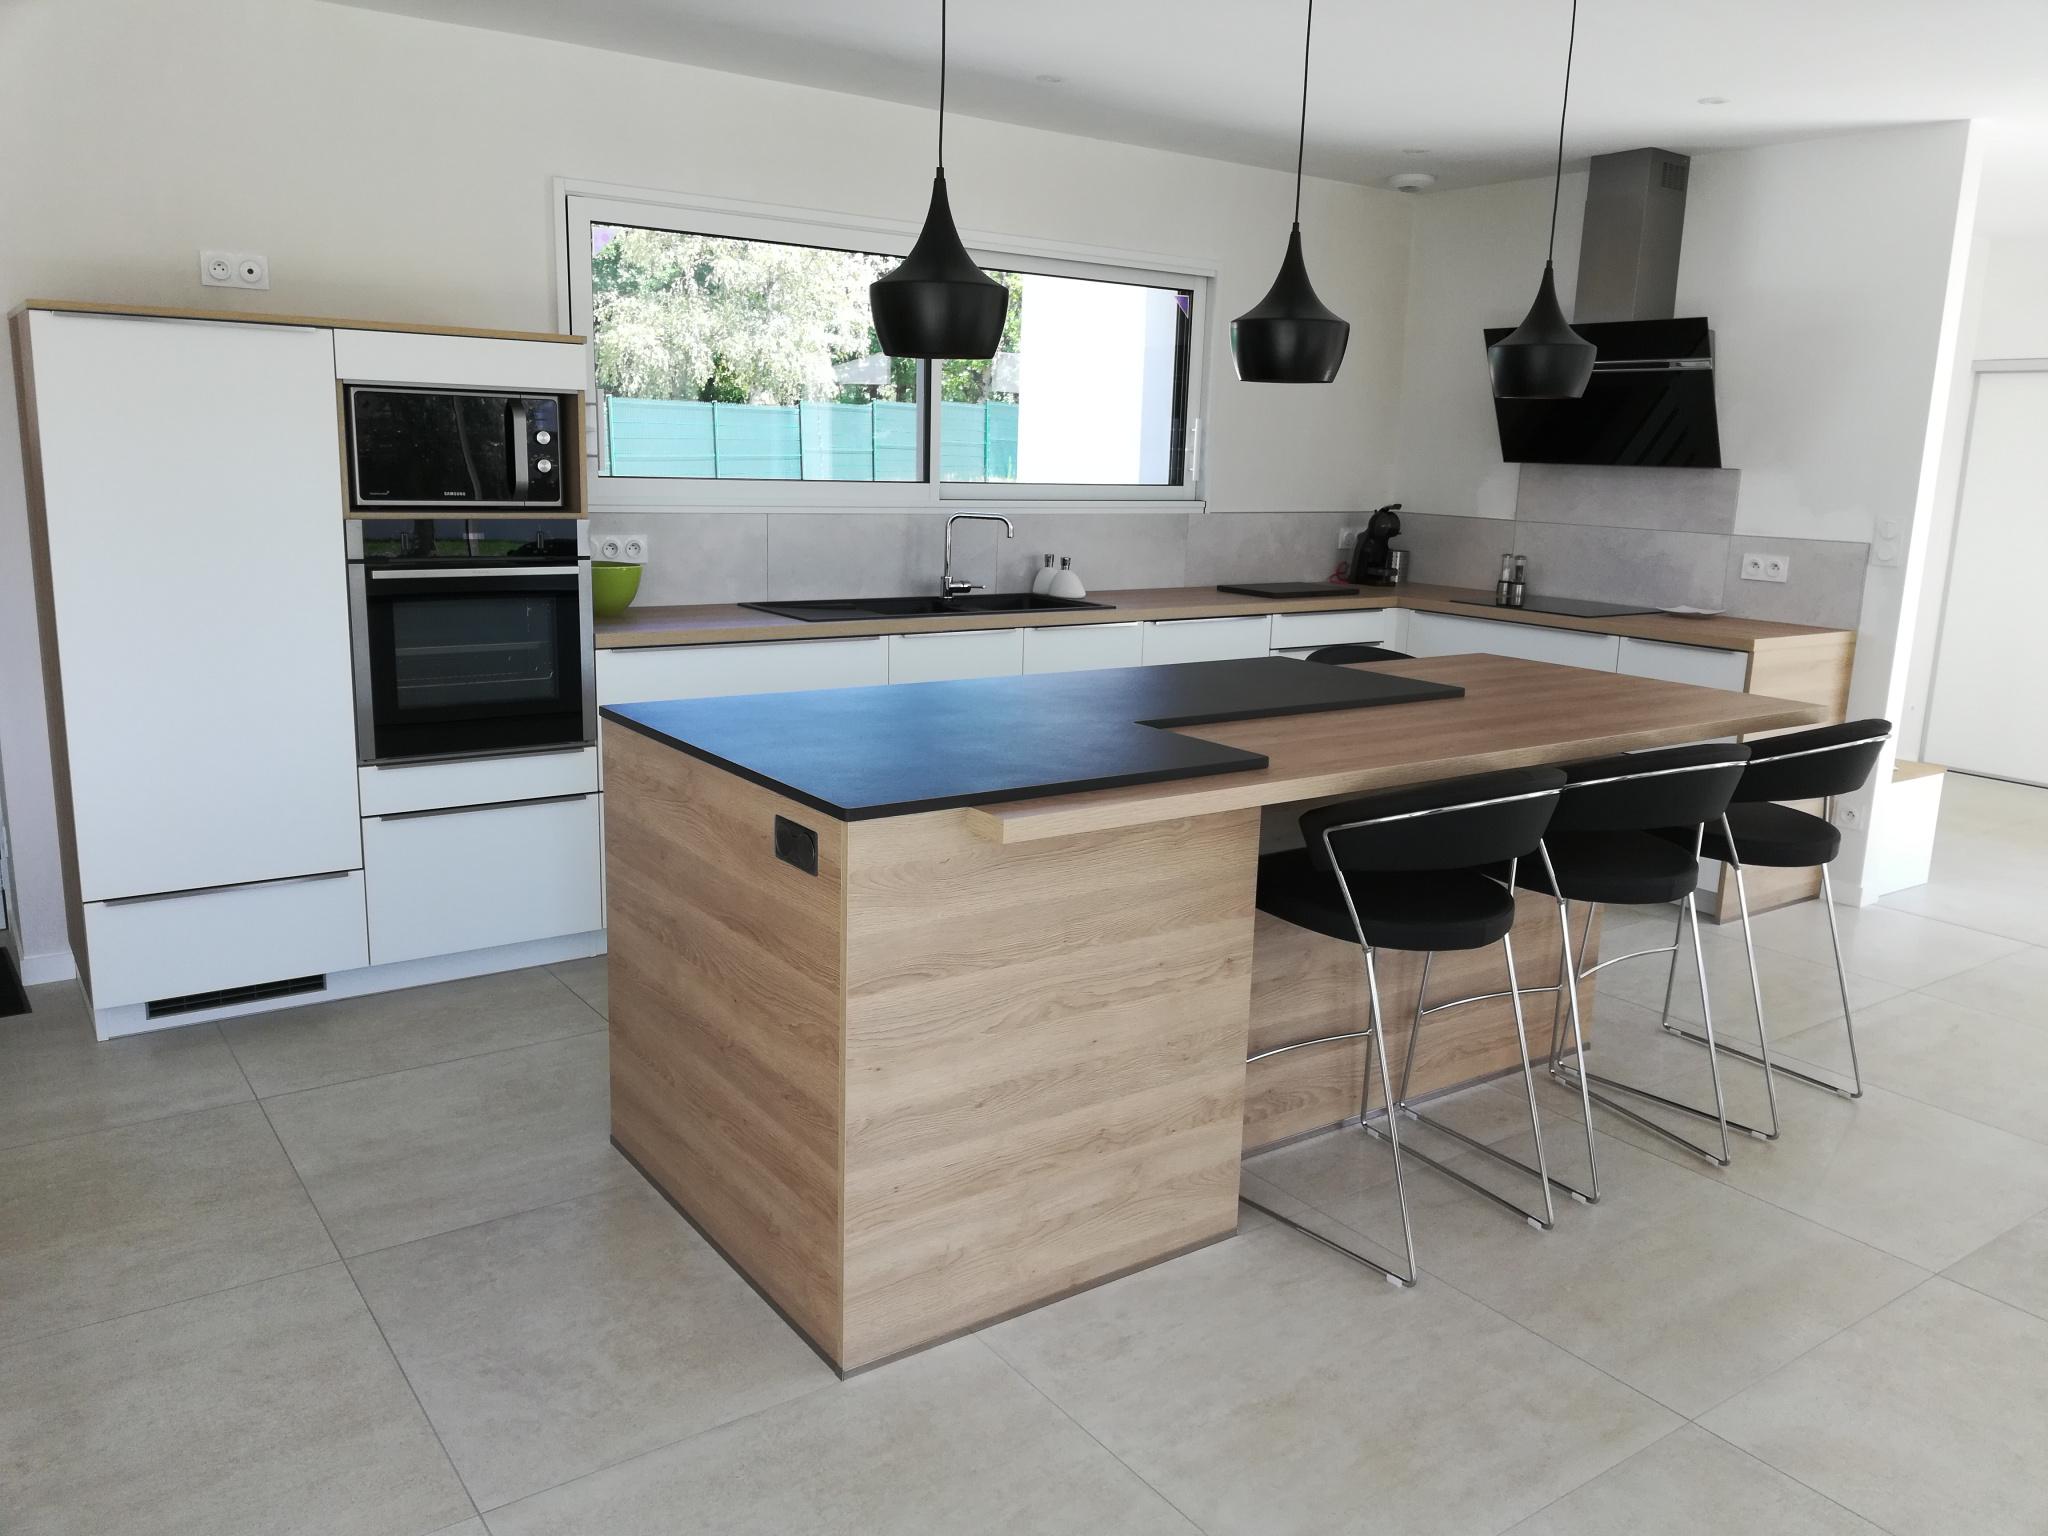 Vente Maison Plein Pied Moderne Bbc